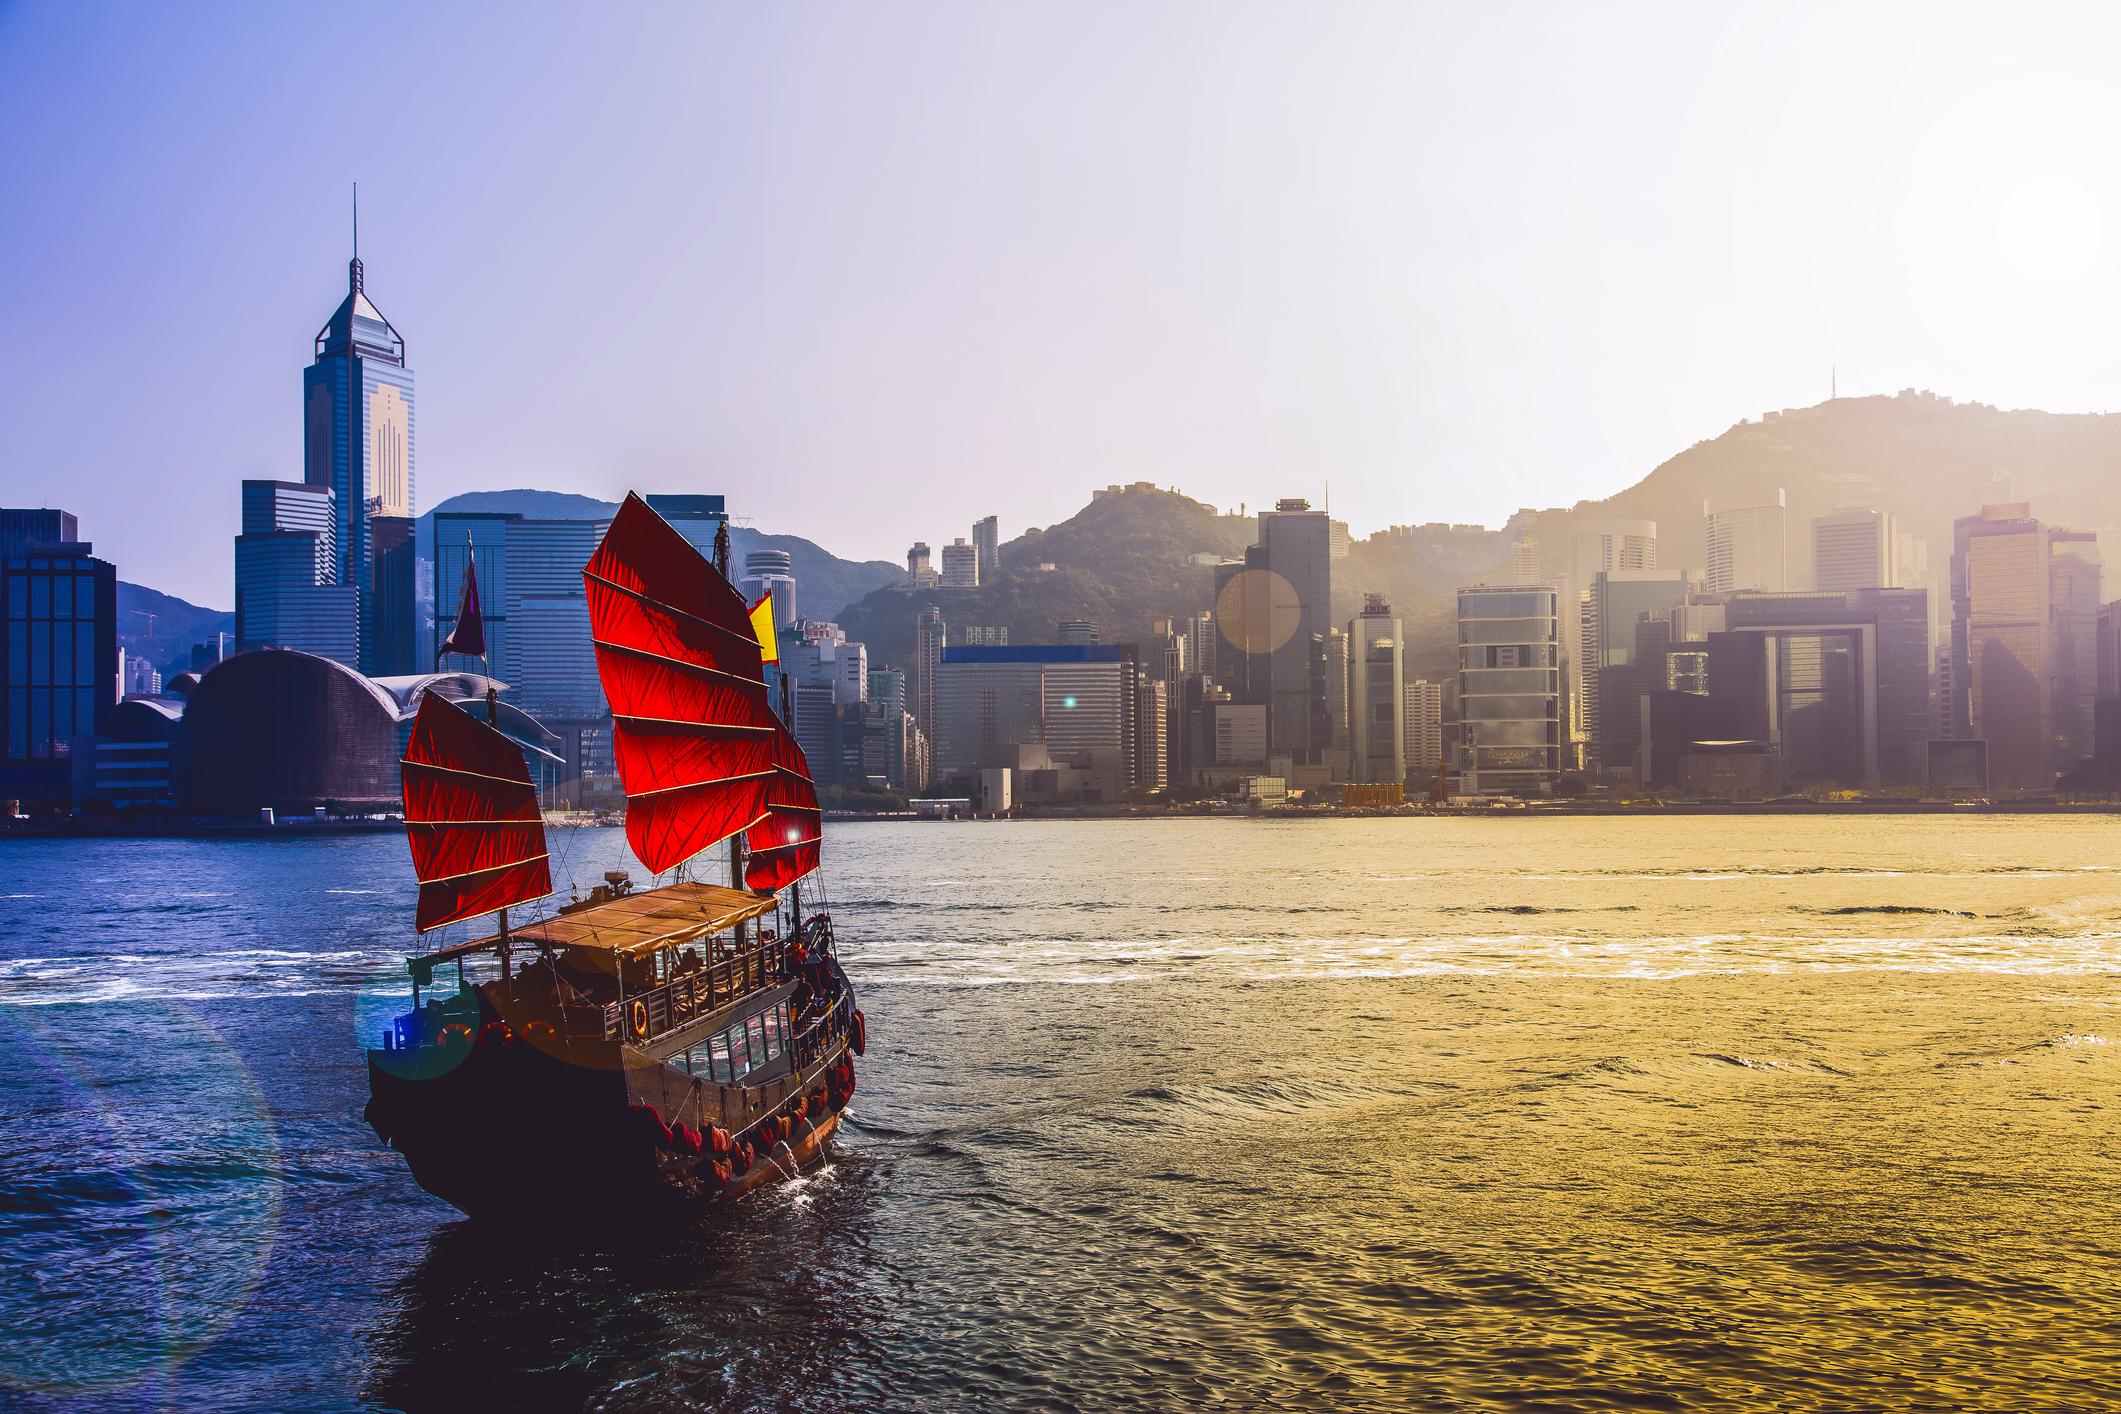 Expats: El regreso al país de origen